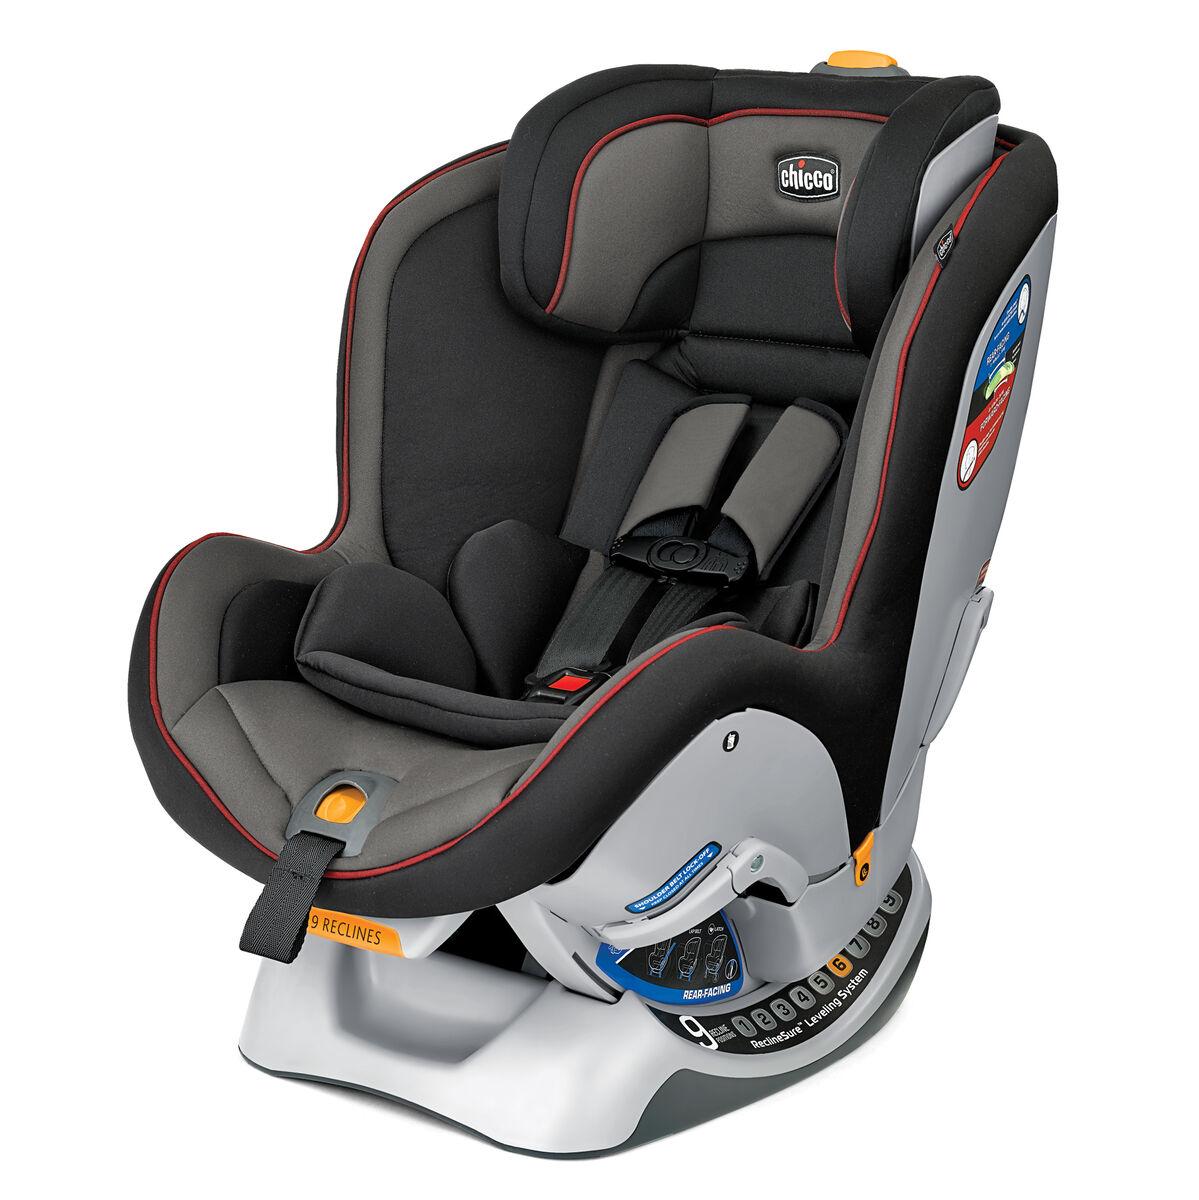 chicco mystique nextfit convertible car seat. Black Bedroom Furniture Sets. Home Design Ideas